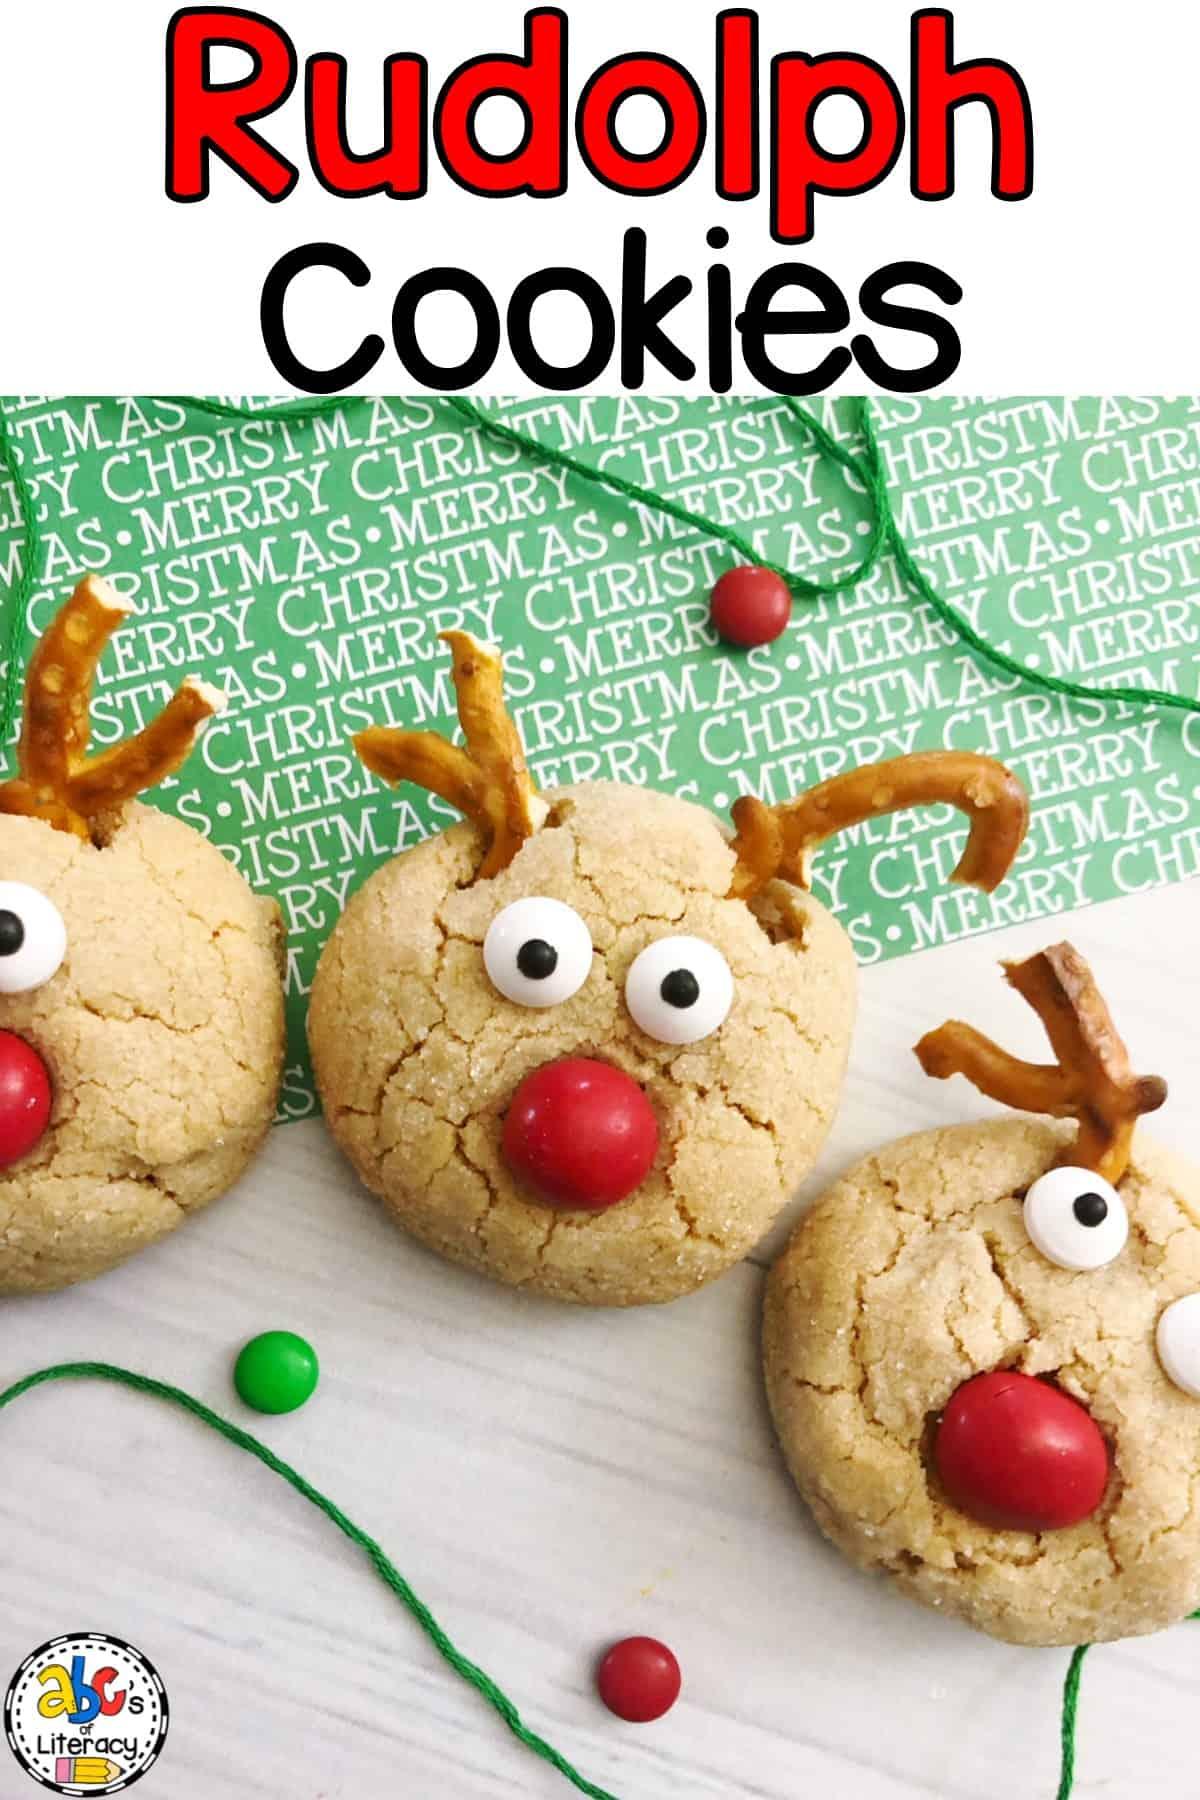 Homemade Rudolph Cookies